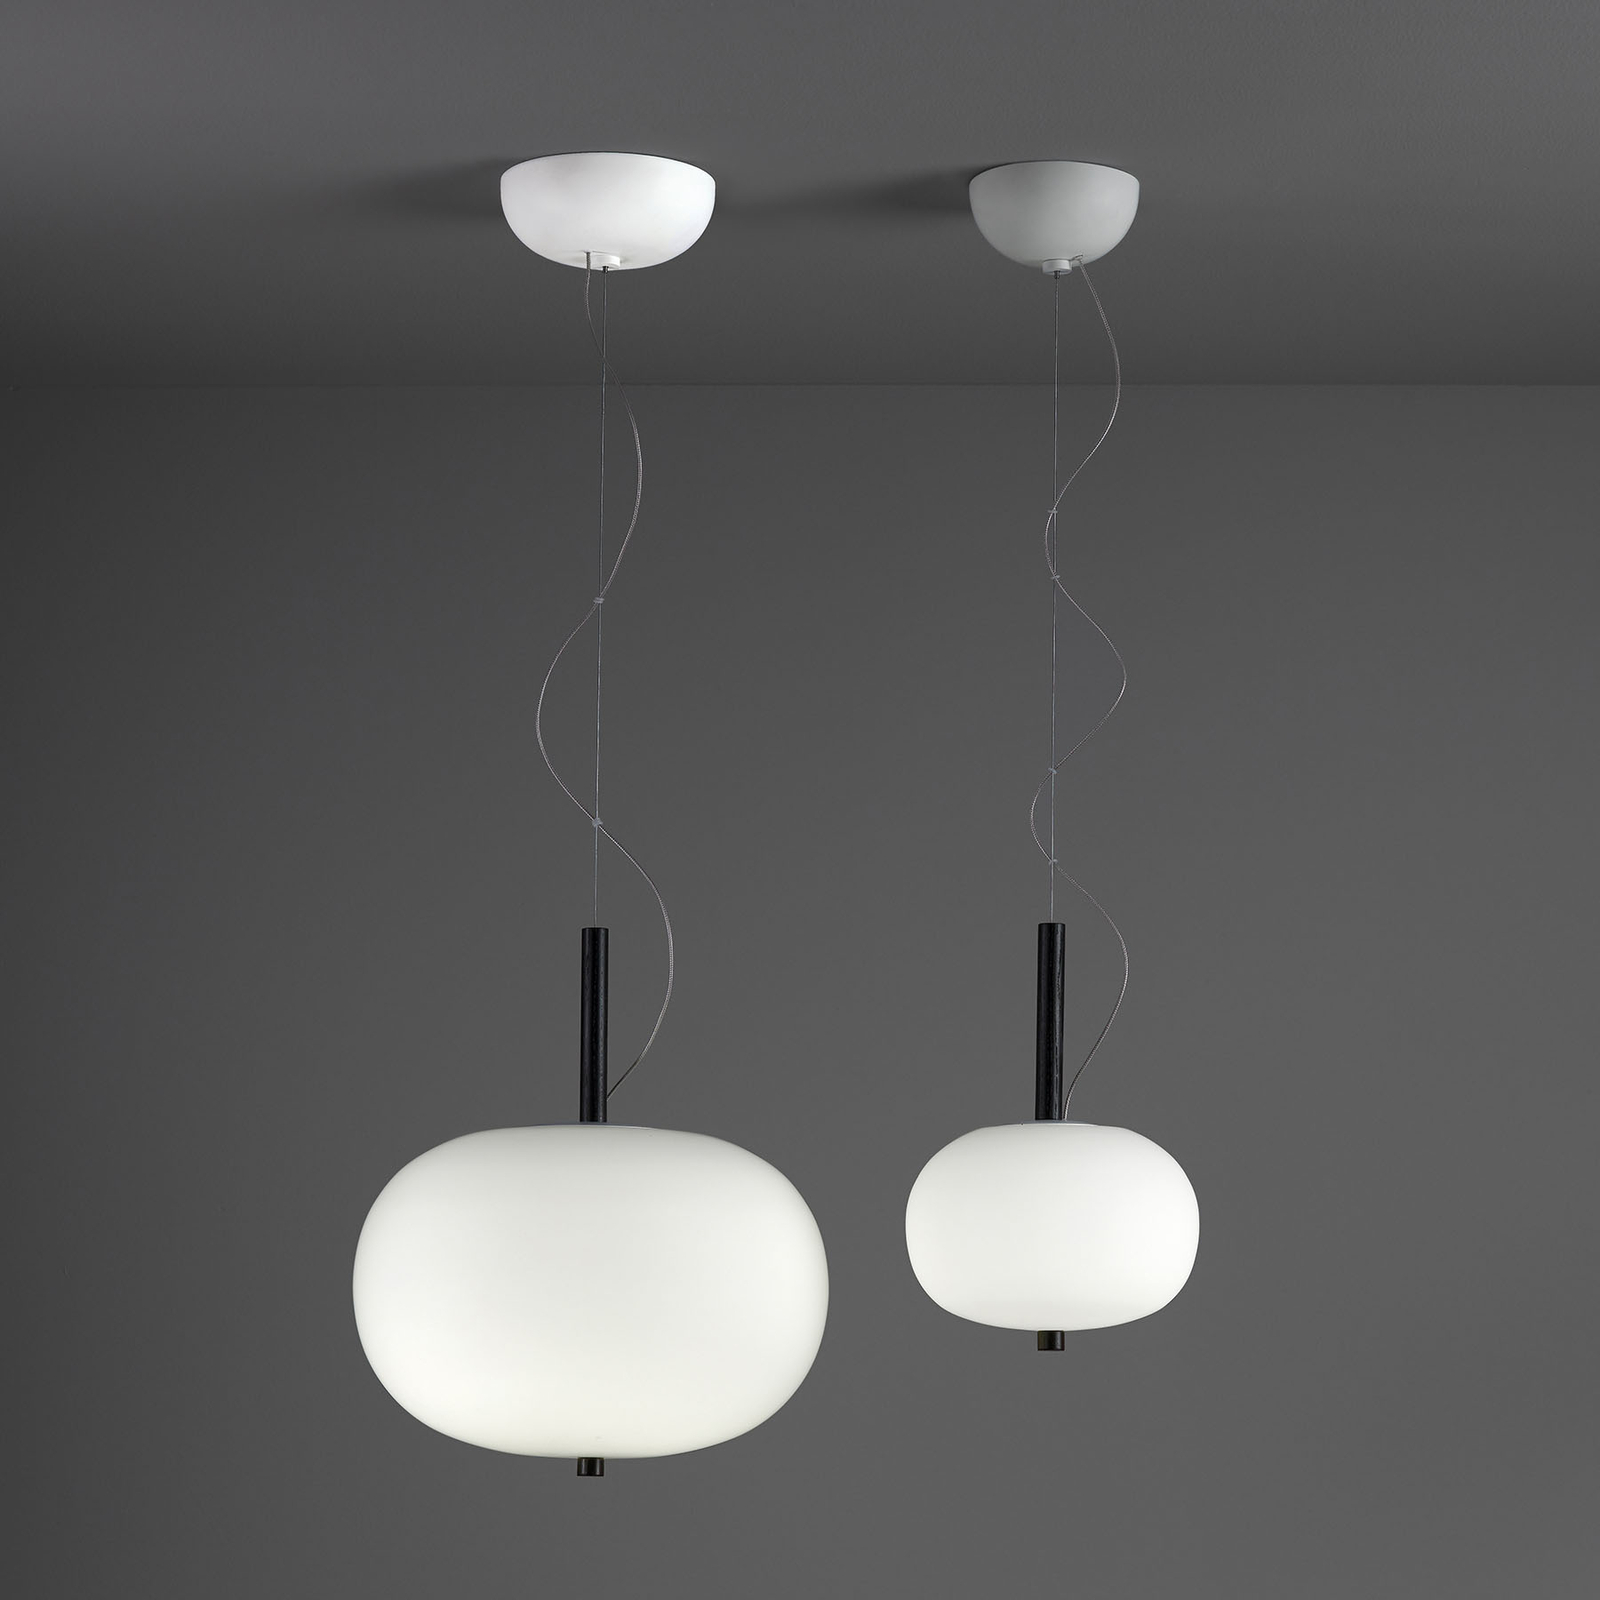 Grok Ilargi -LED-riippuvalo, tumma, Ø 39,5 cm